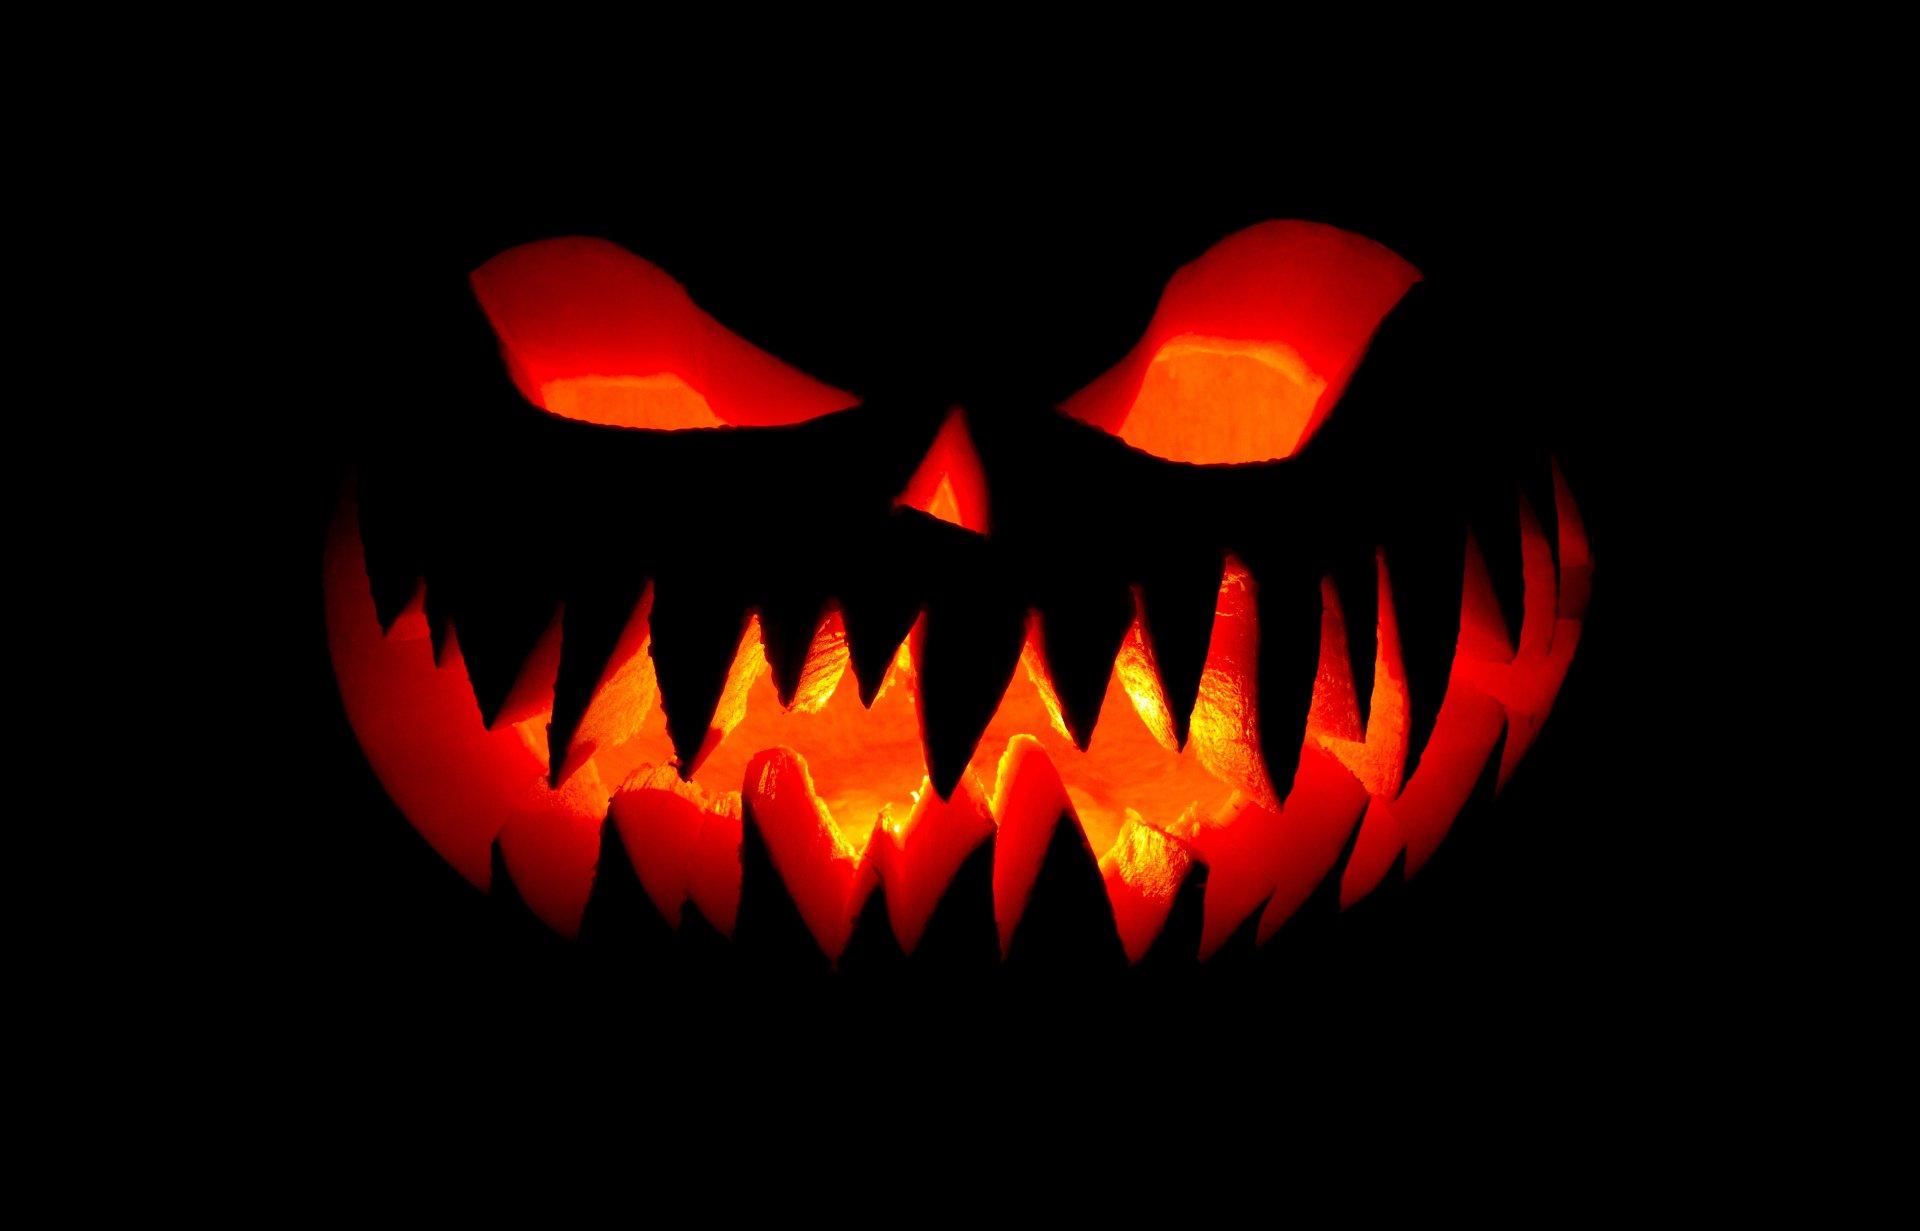 Holiday - Halloween  Holiday Jack-o'-lantern Wallpaper